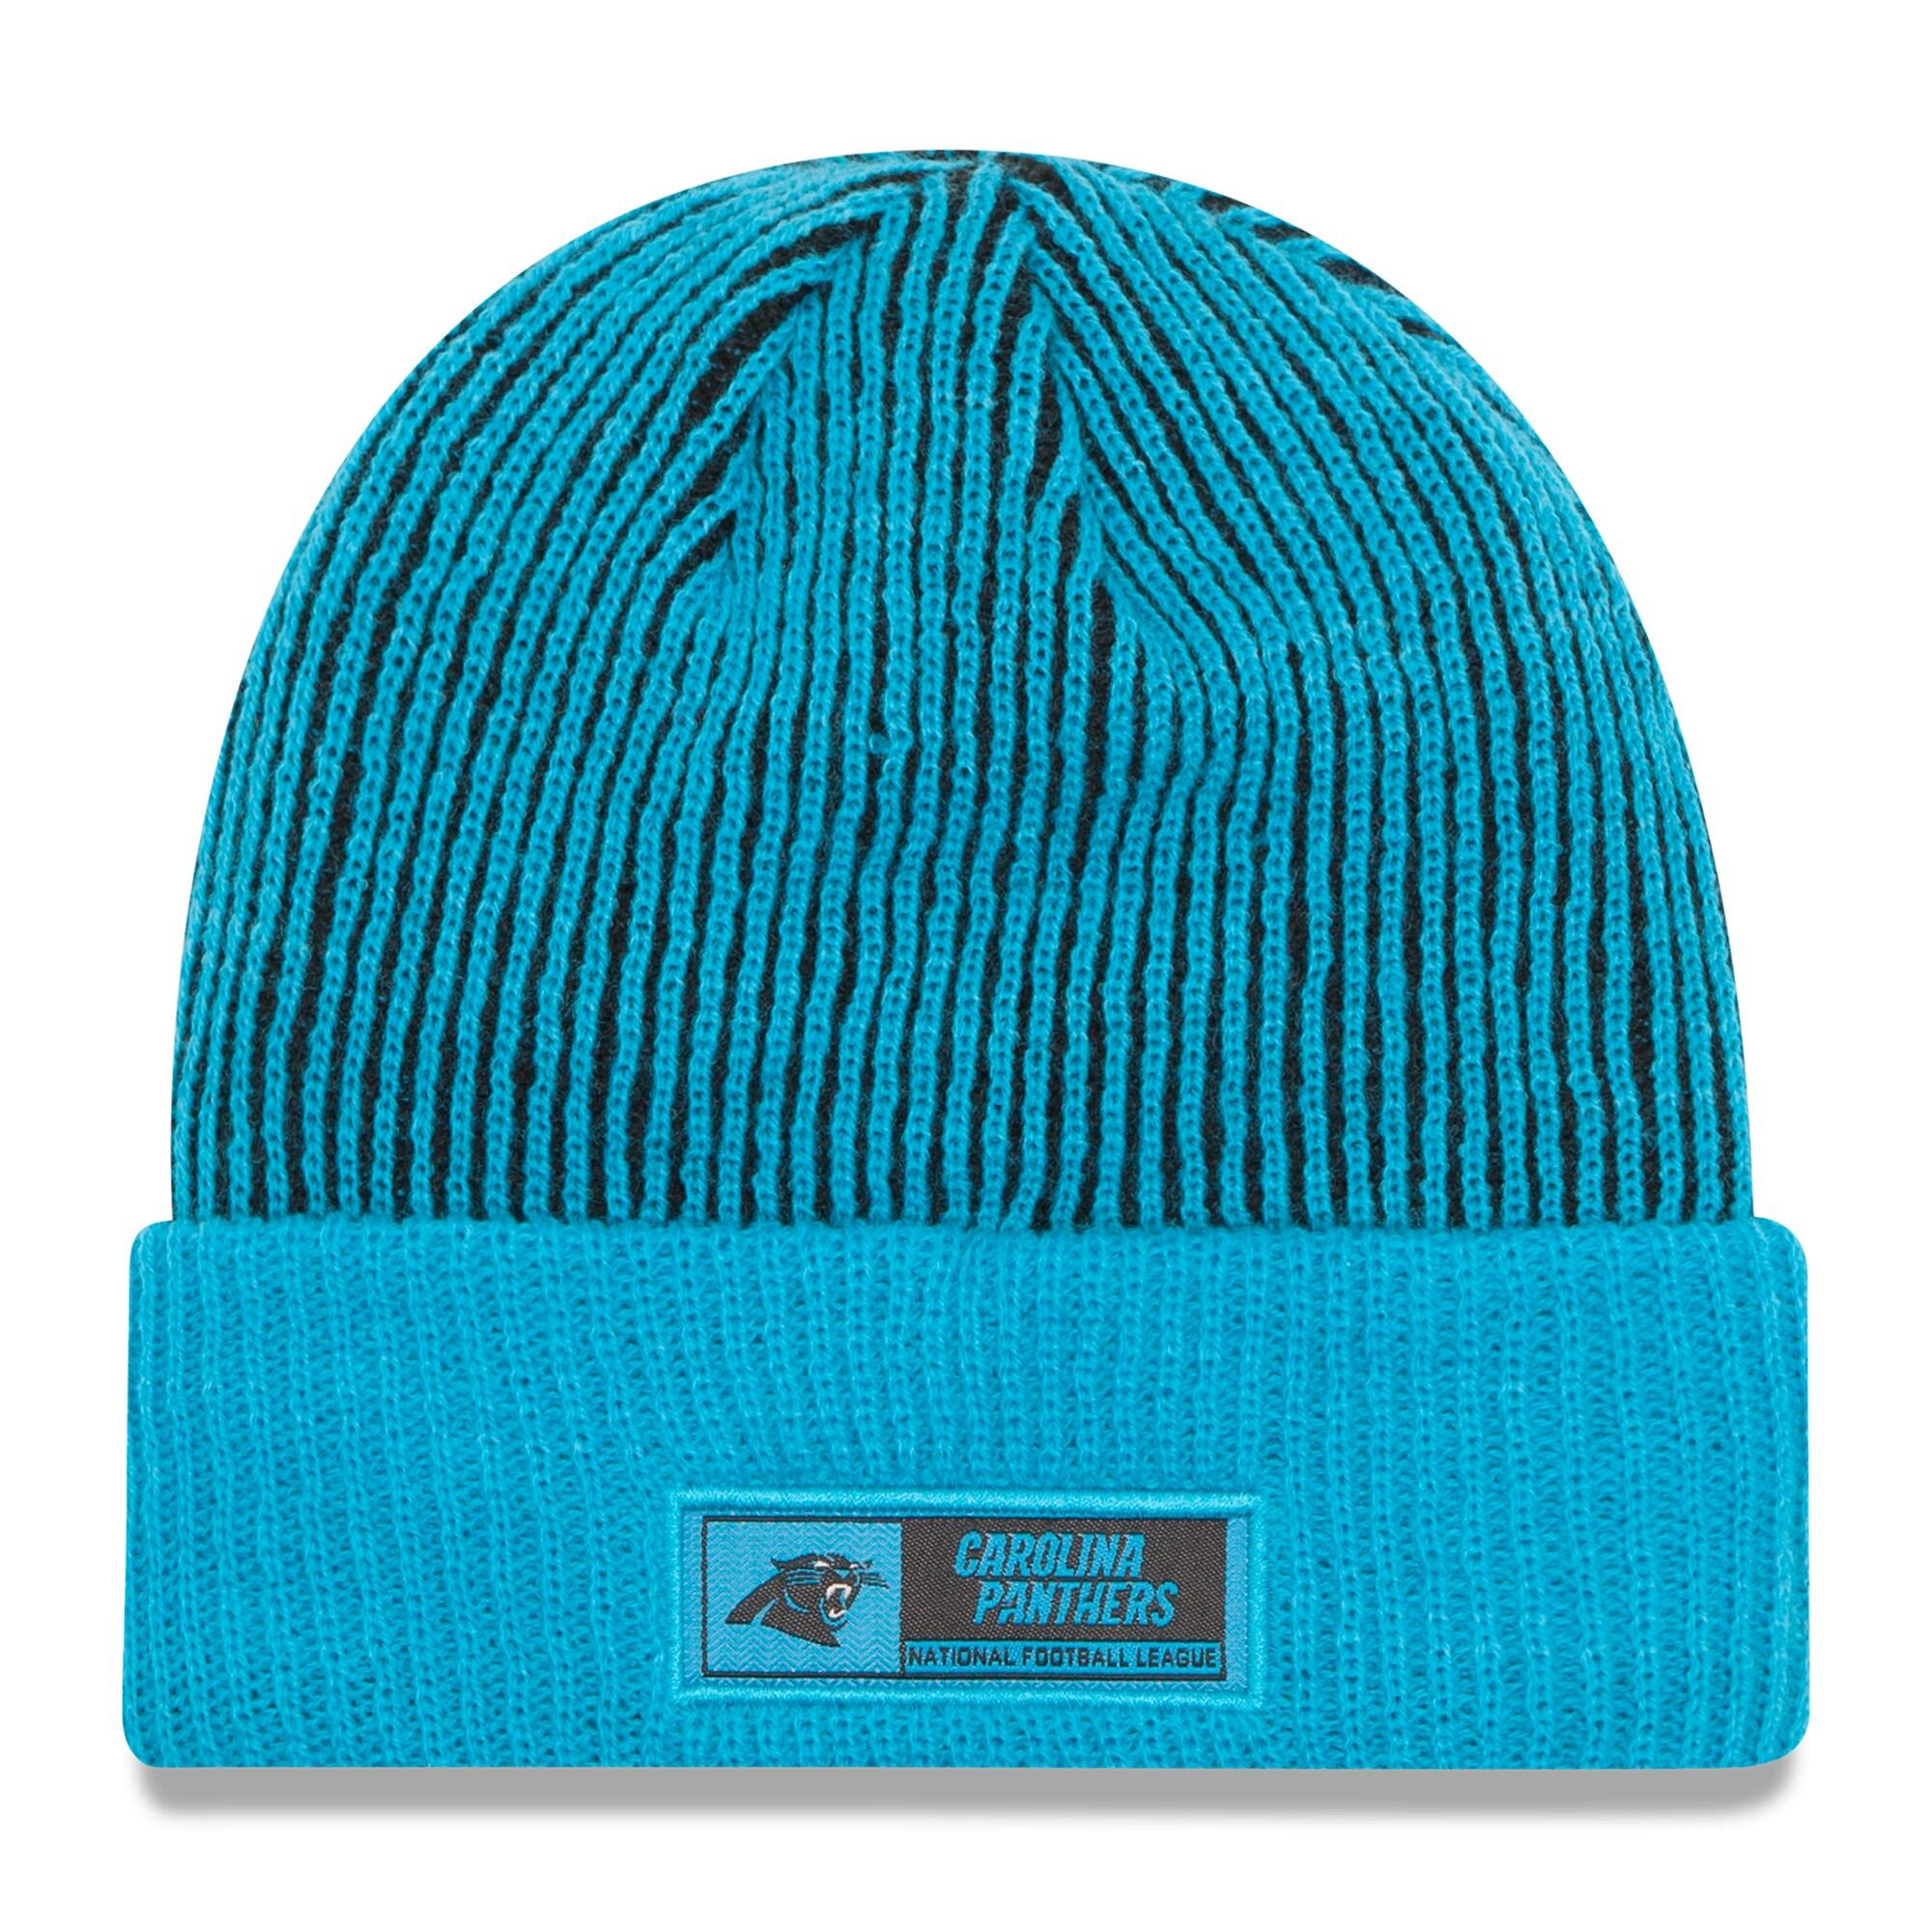 Carolina Panthers New Era Sideline Official Tech Knit Hat - Blue